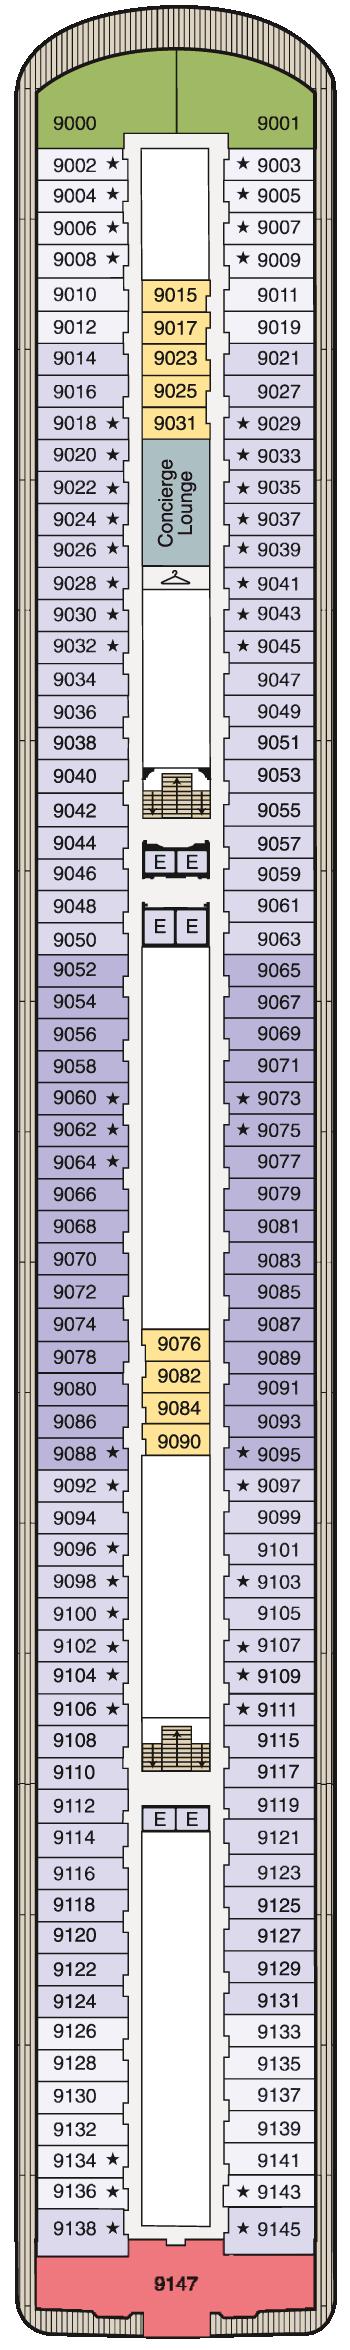 MS Marina - Deck 9